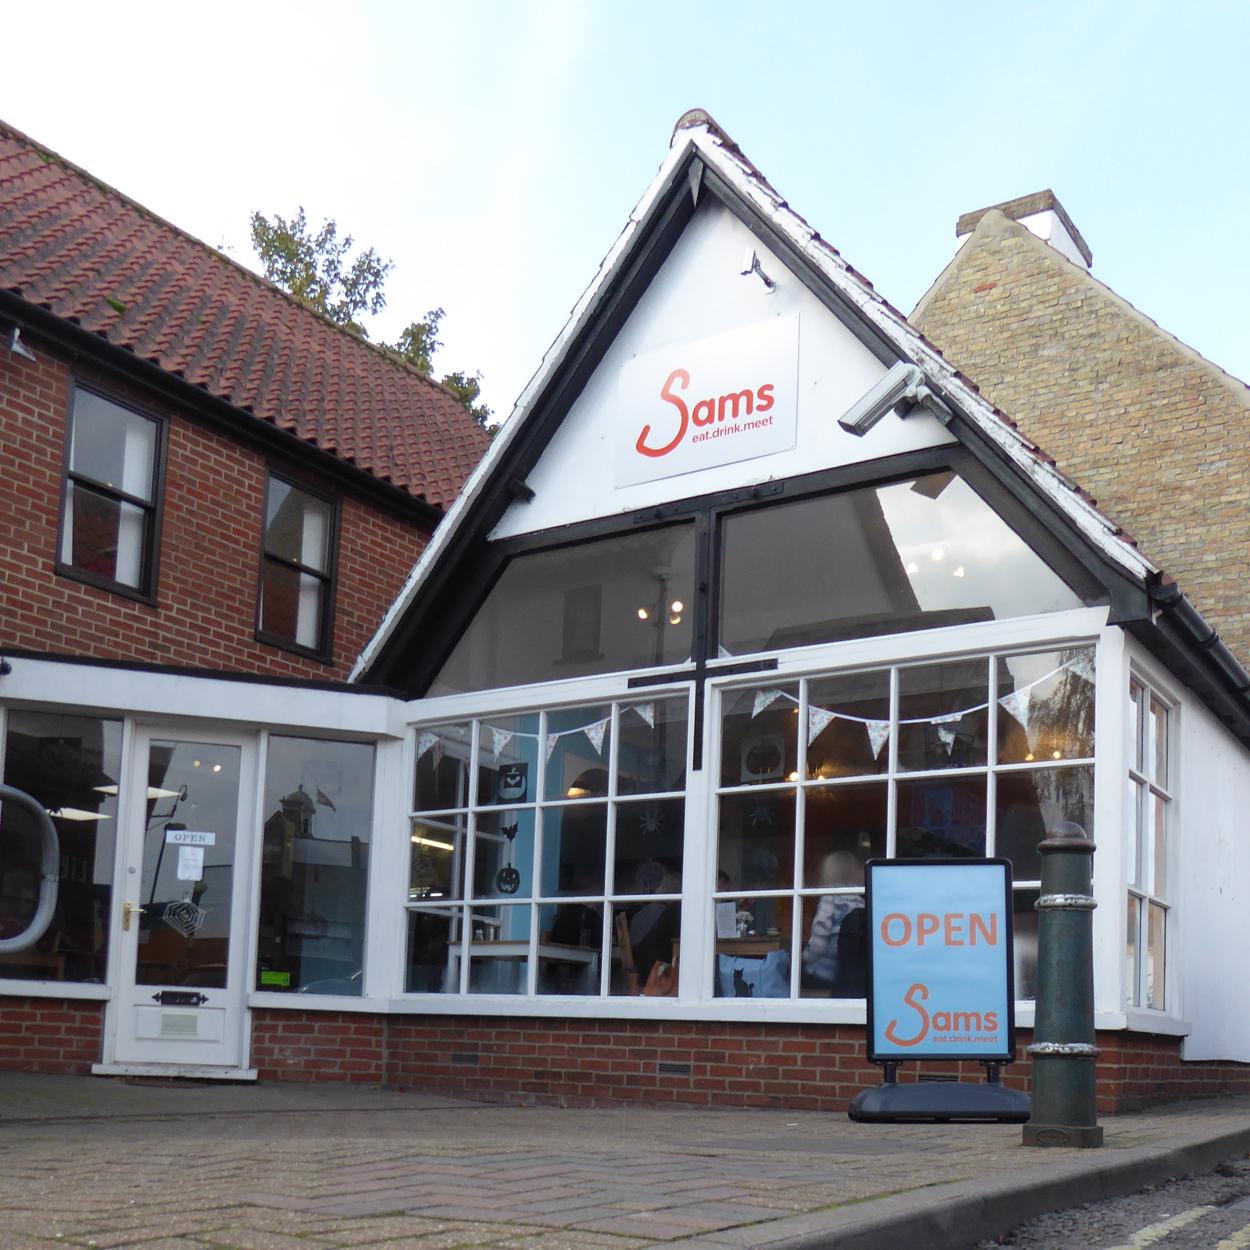 Sams | Tanner Street | Thetford | IP24 2BQ